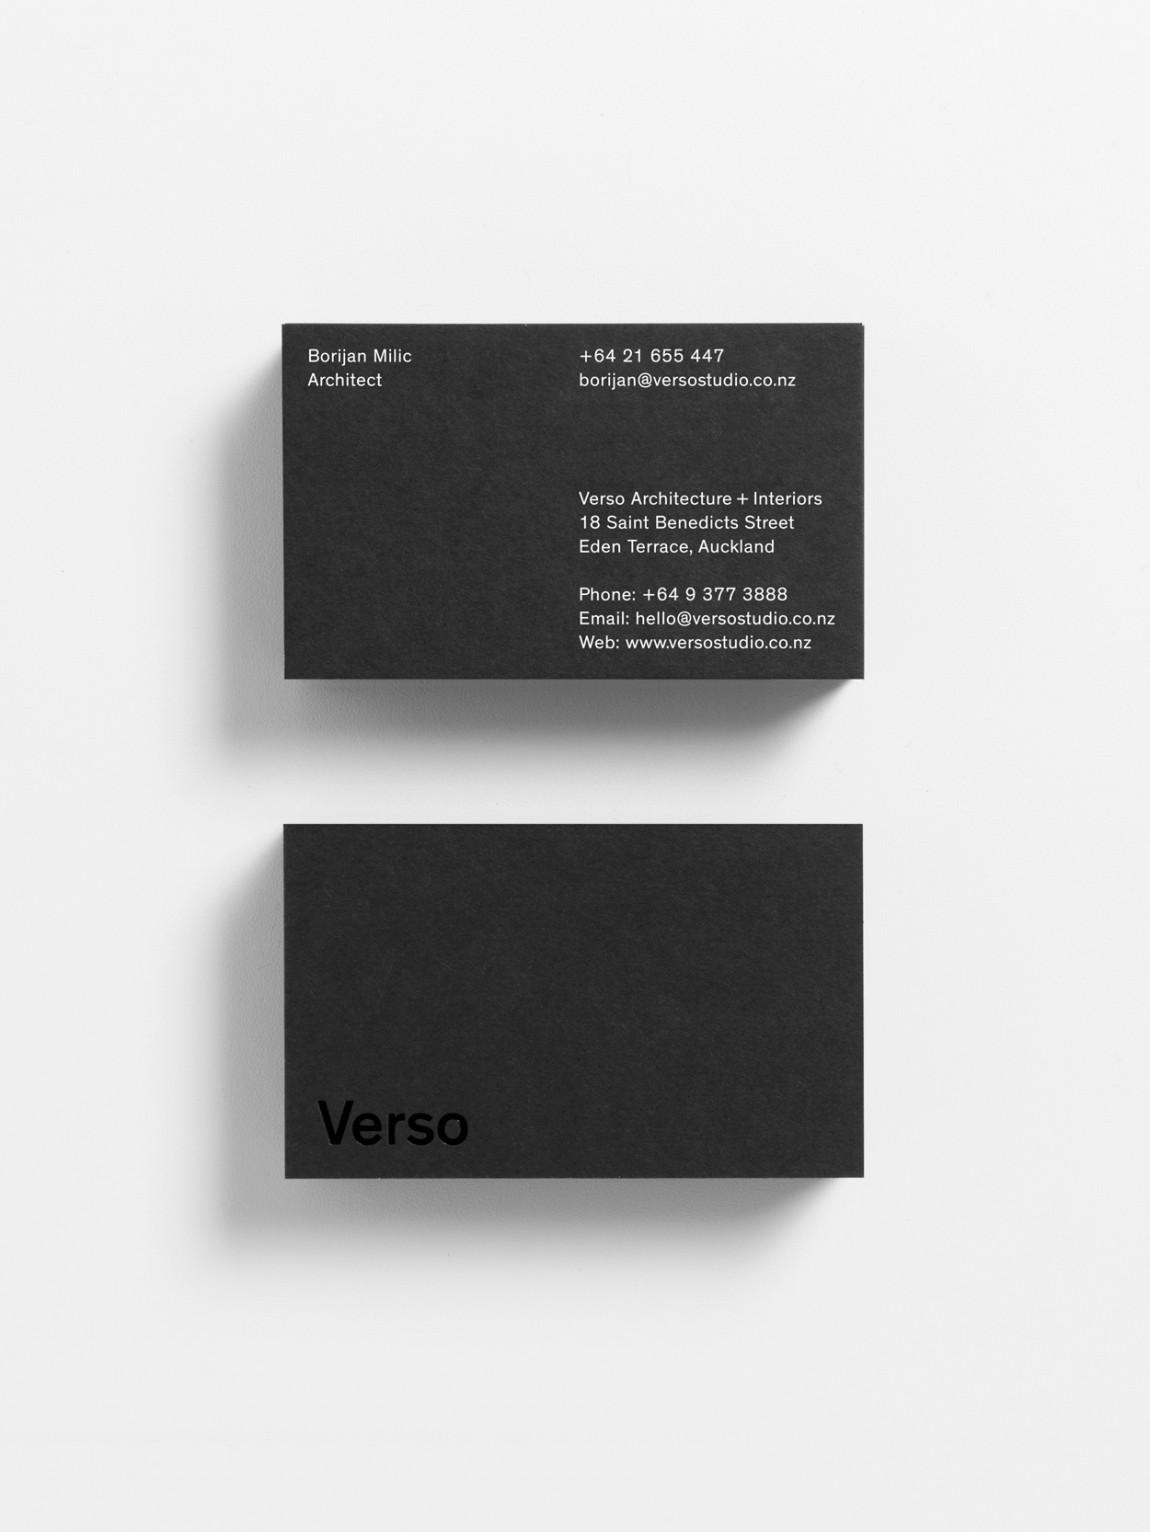 Verso建筑空间设计公司企业形象VI设计,名牌设计